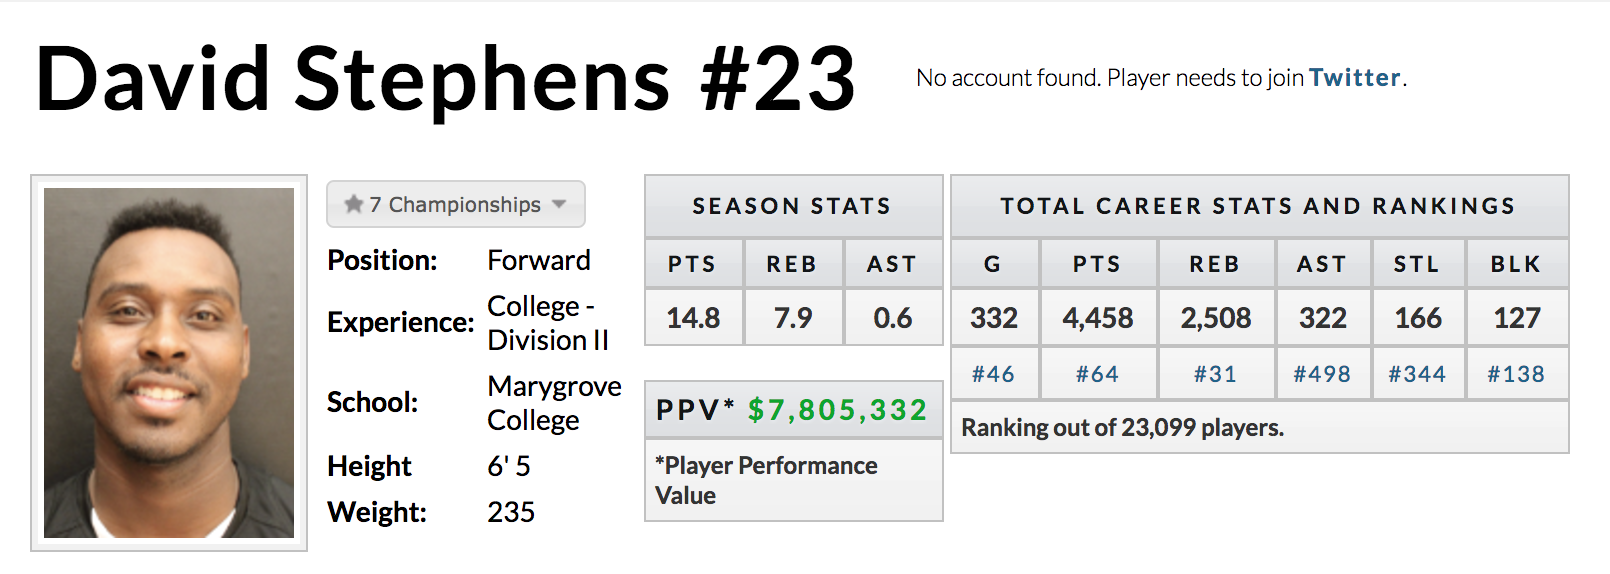 David Stephens' career stats.